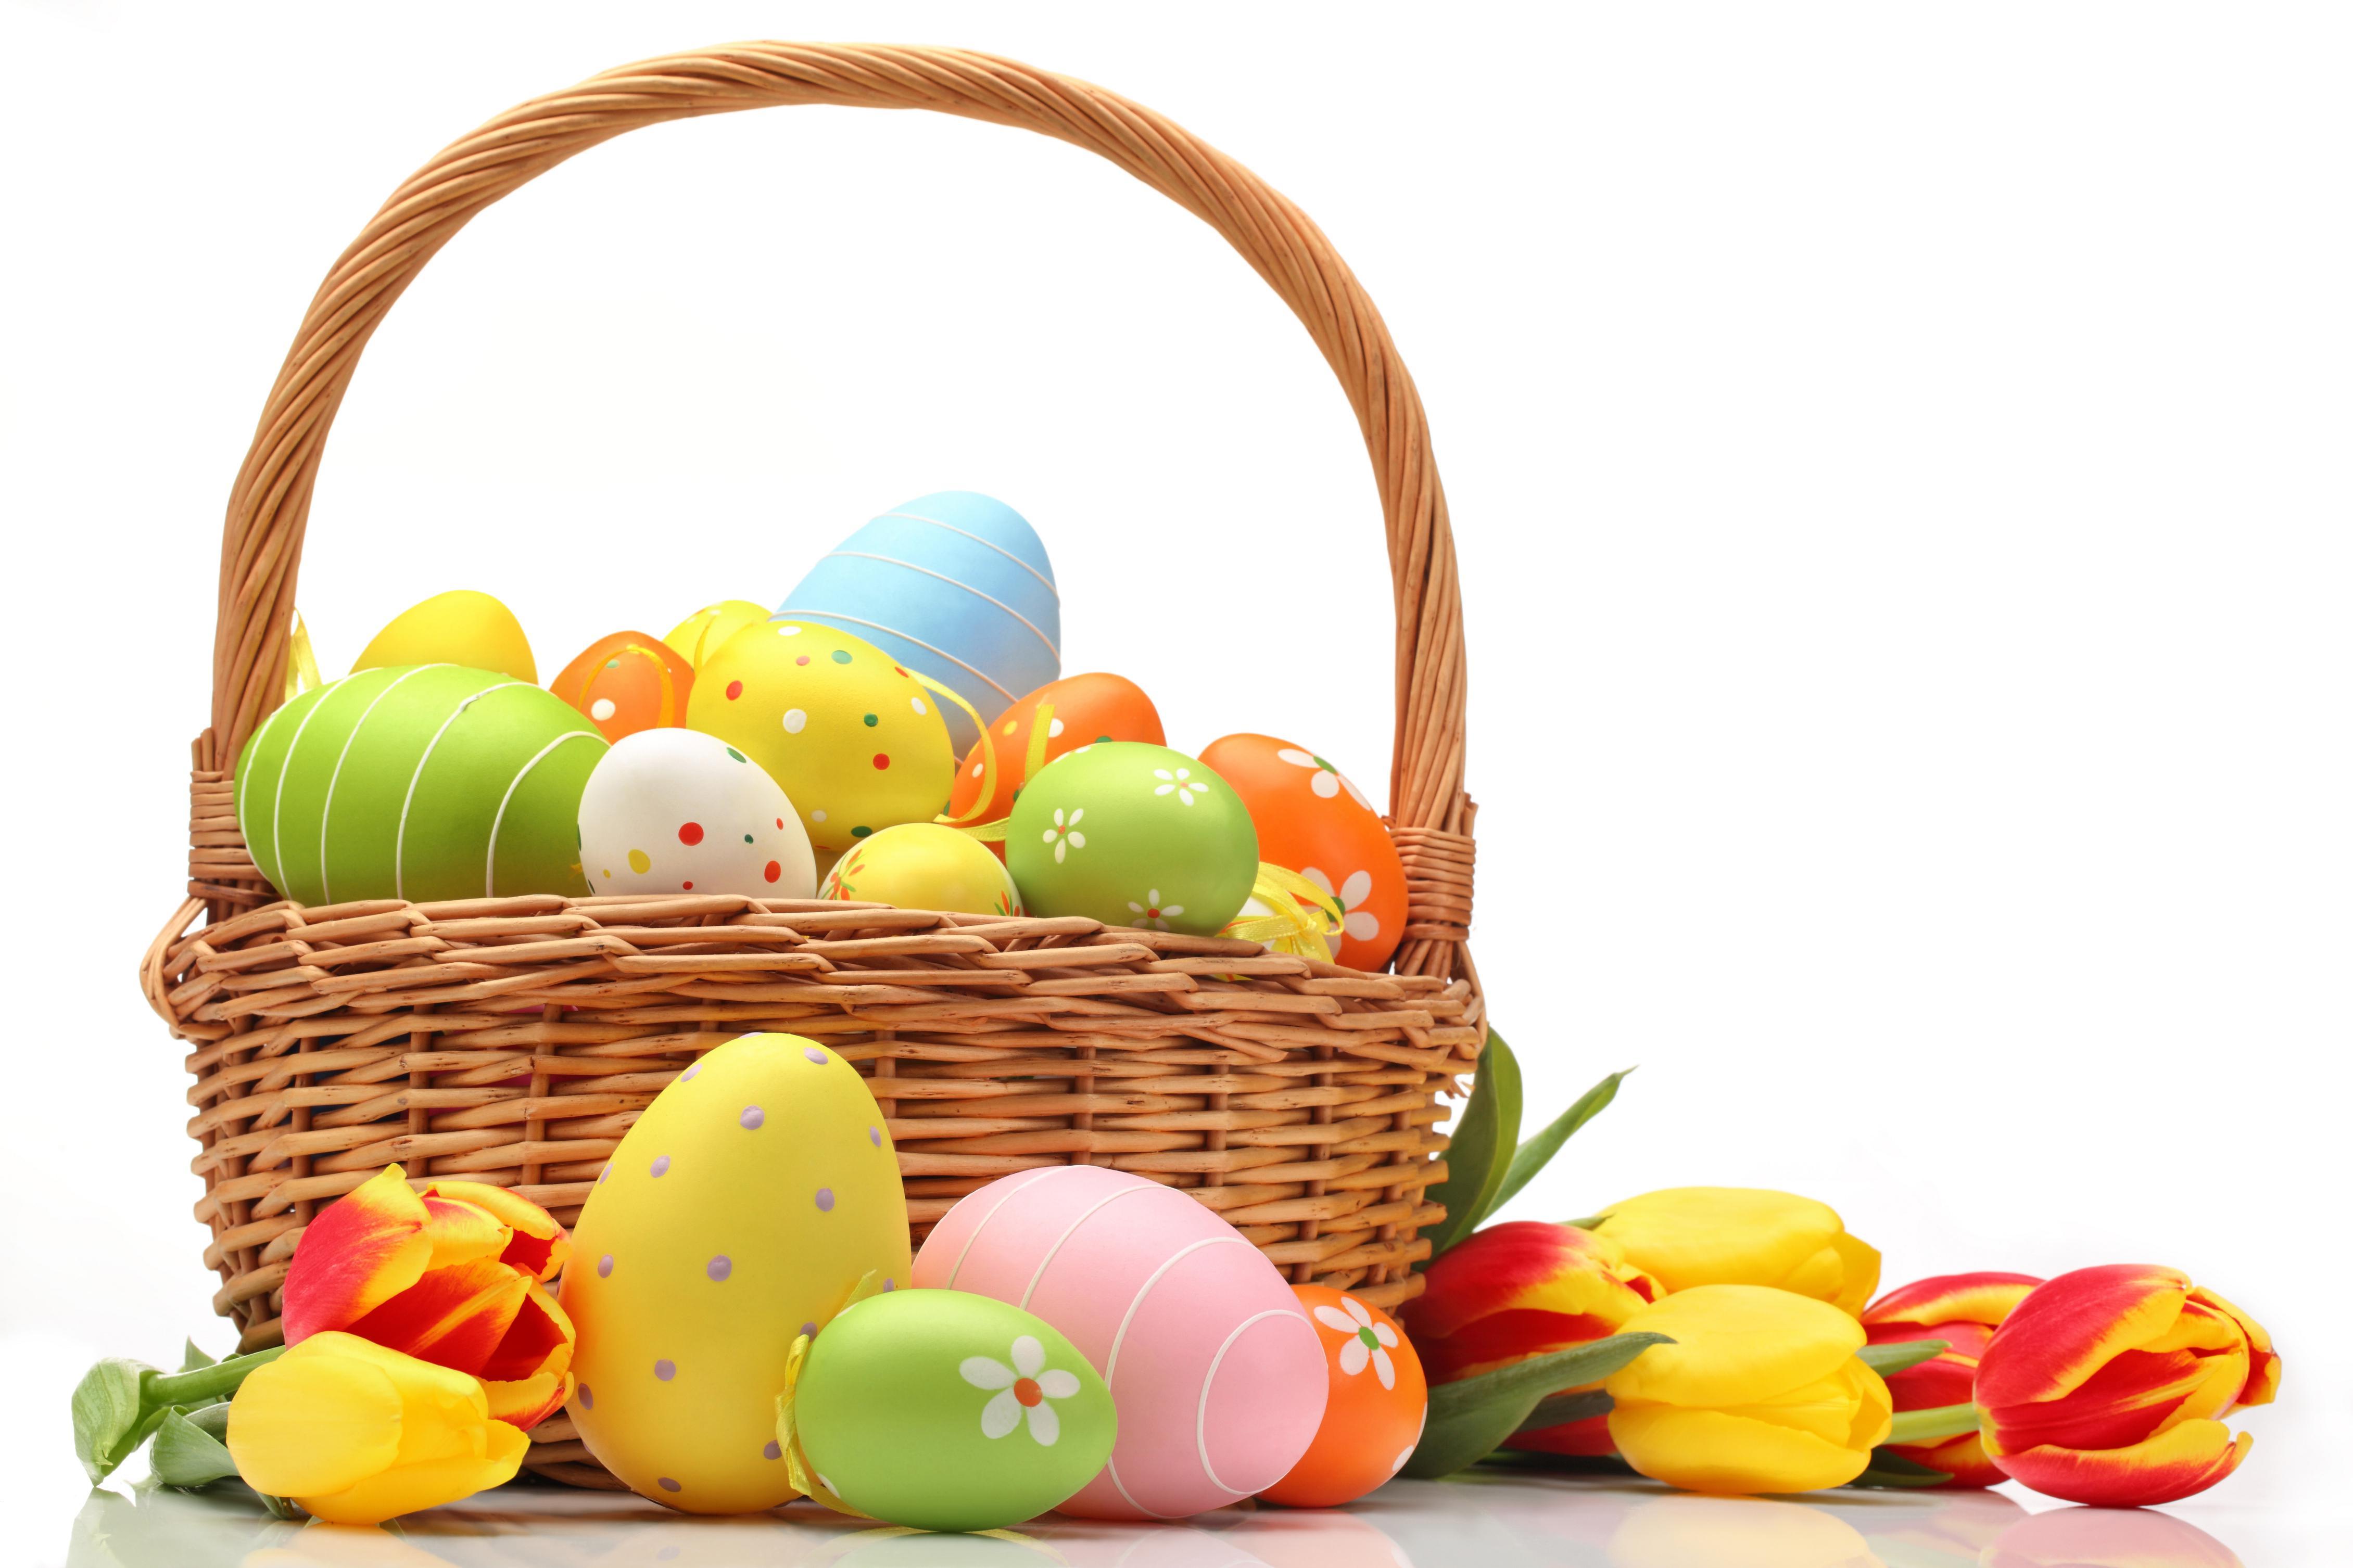 Easter 2016 wallpaper egg basket creative ads and more easter 2016 wallpaper egg basket negle Image collections